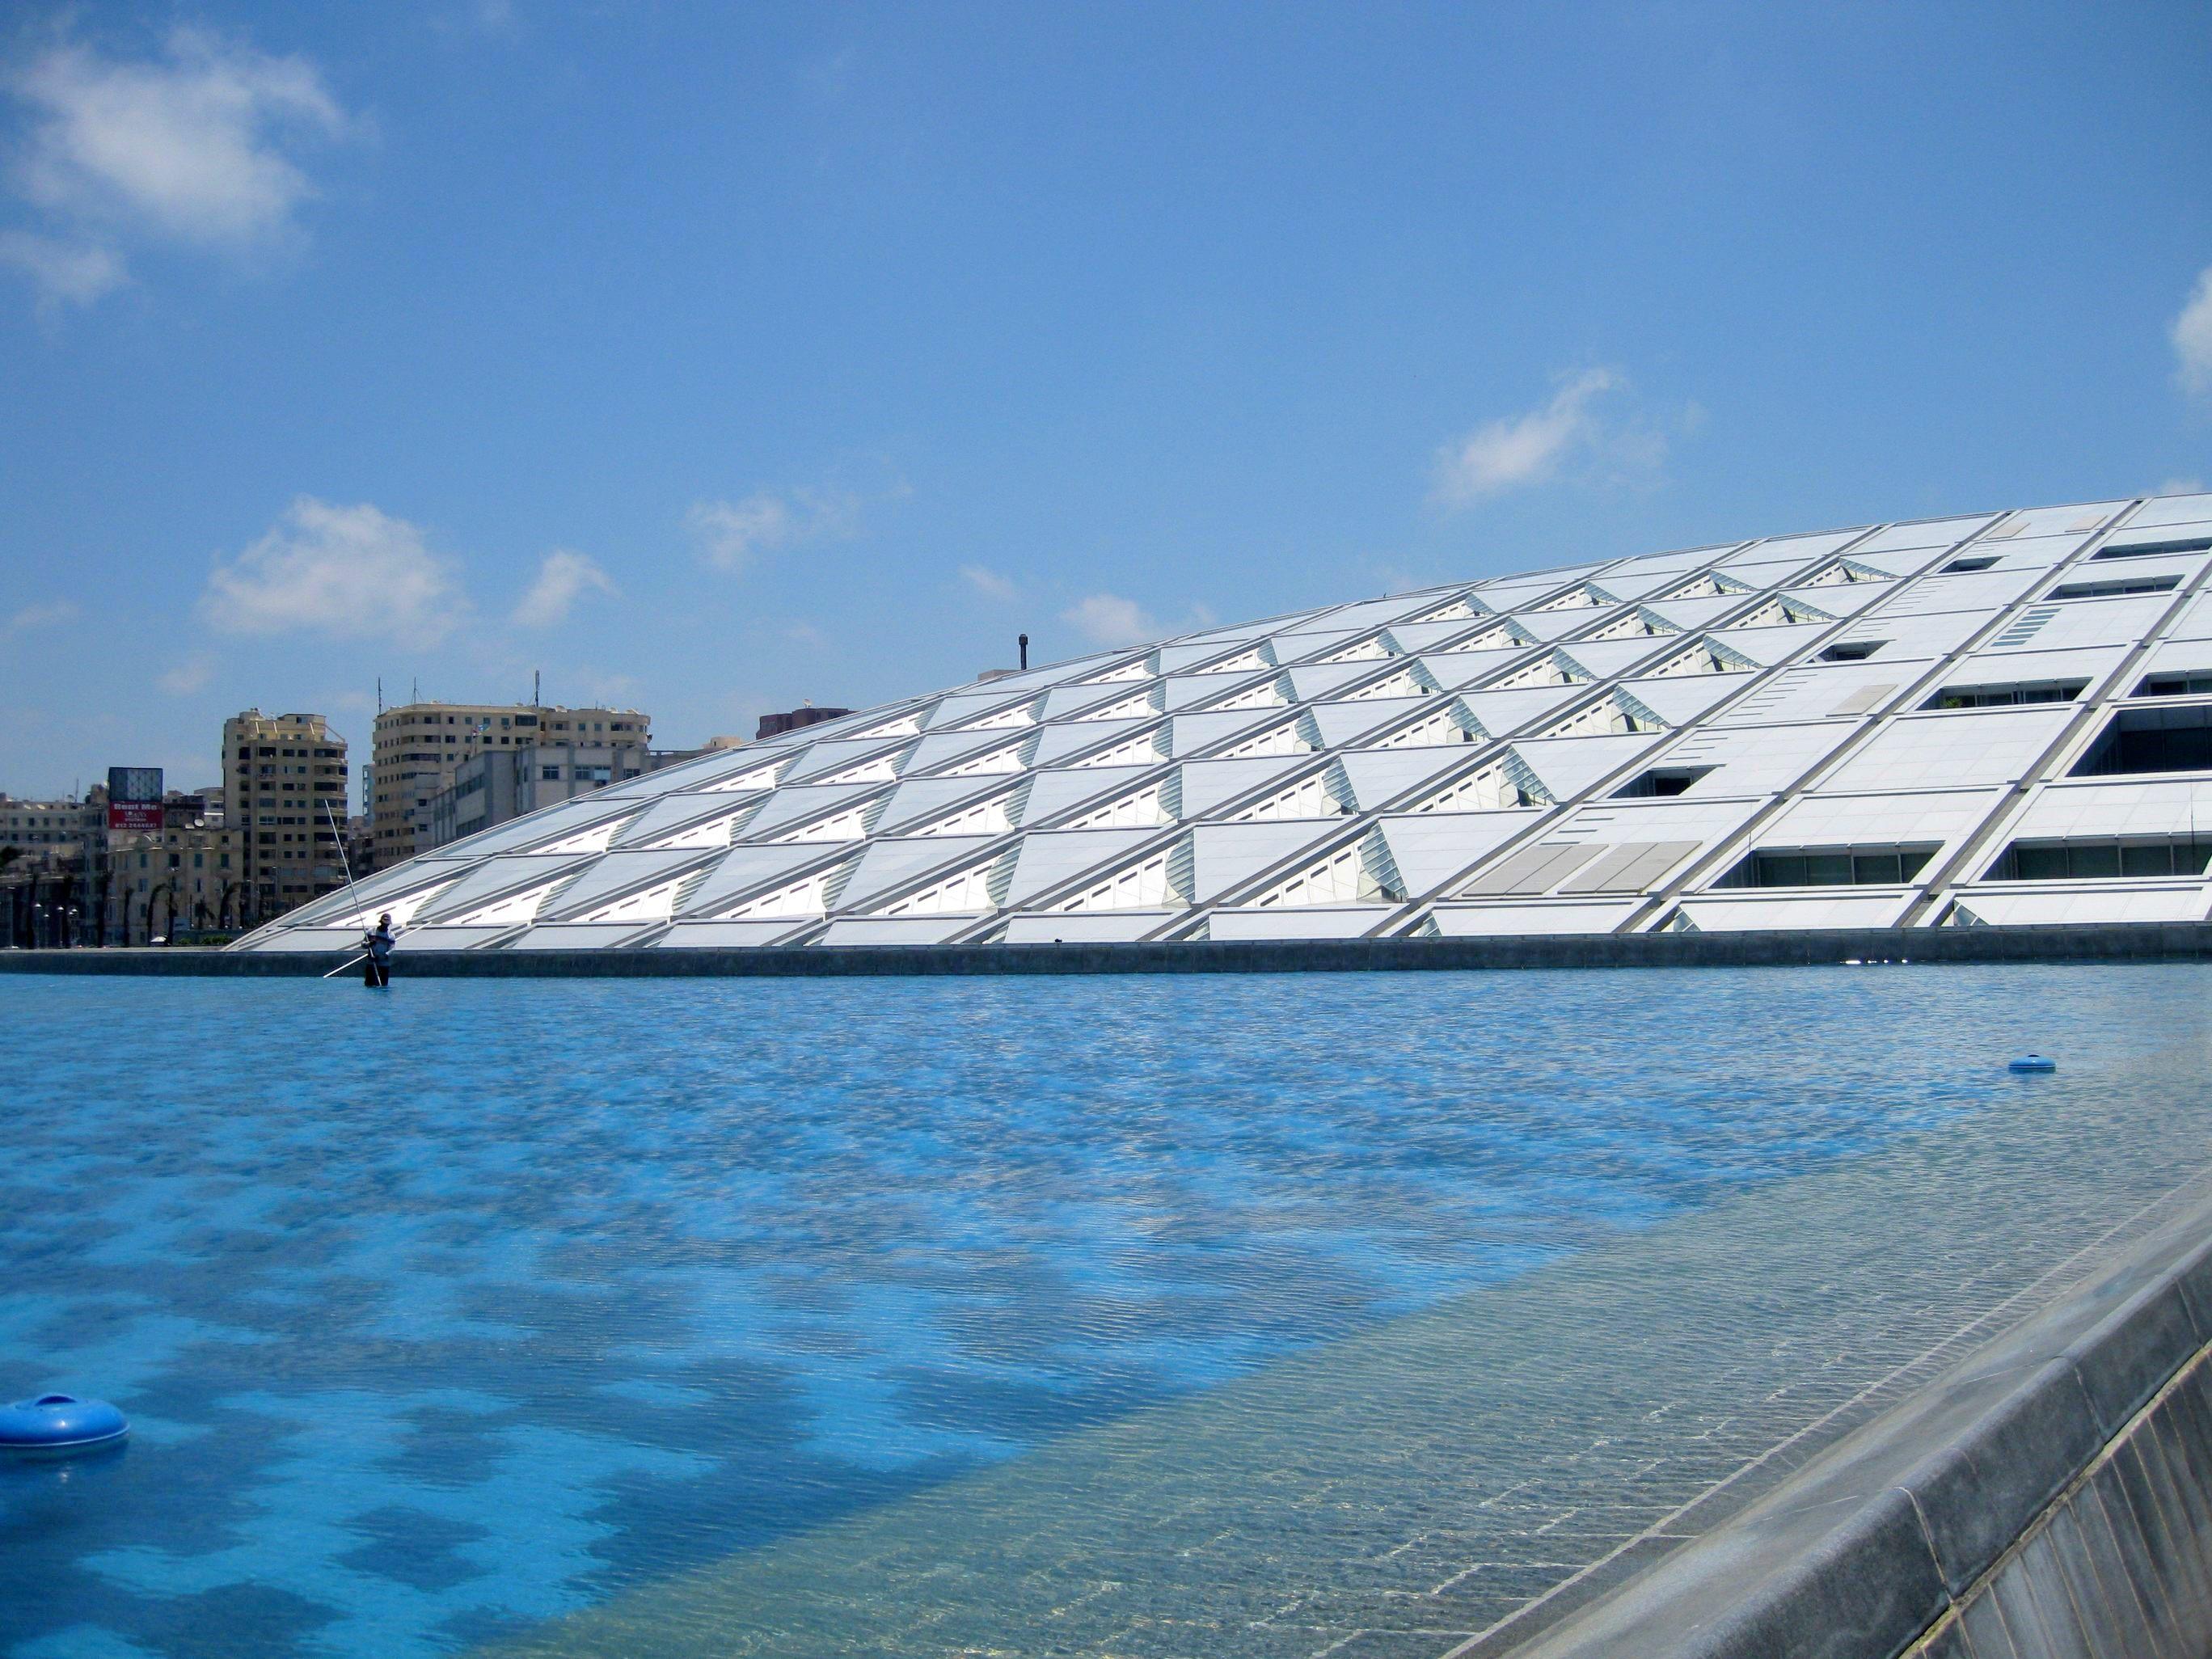 File:Bibliotheque, Alexandria, Egypt.JPG - Wikimedia Commons